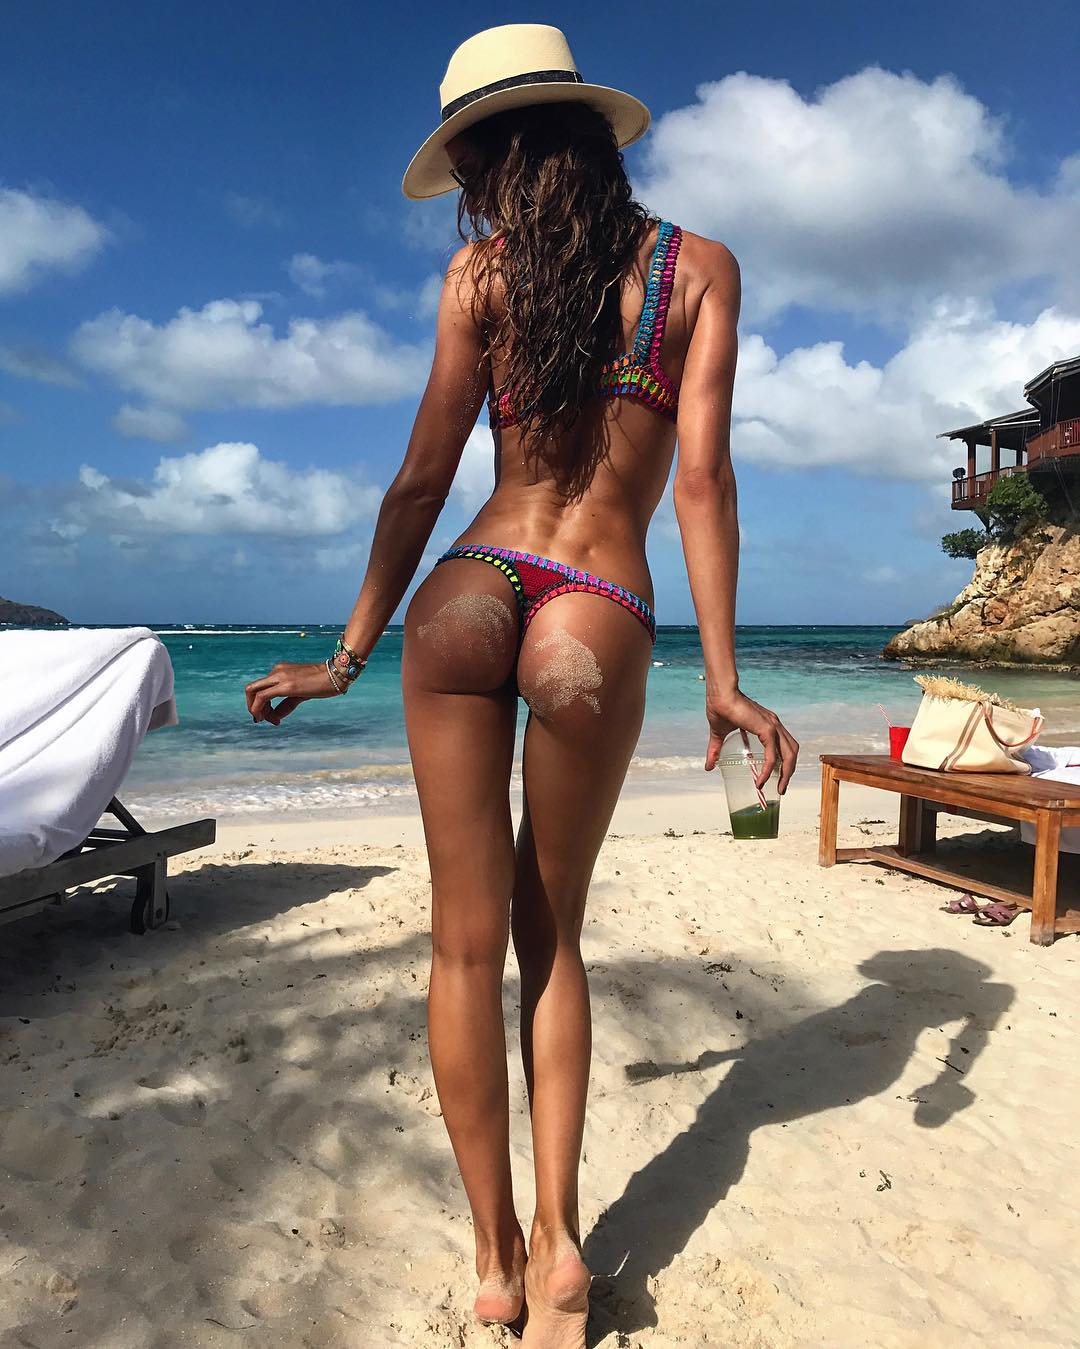 Bumbum da modelo Izabel Goulart vira obsessão após flagra, veja!